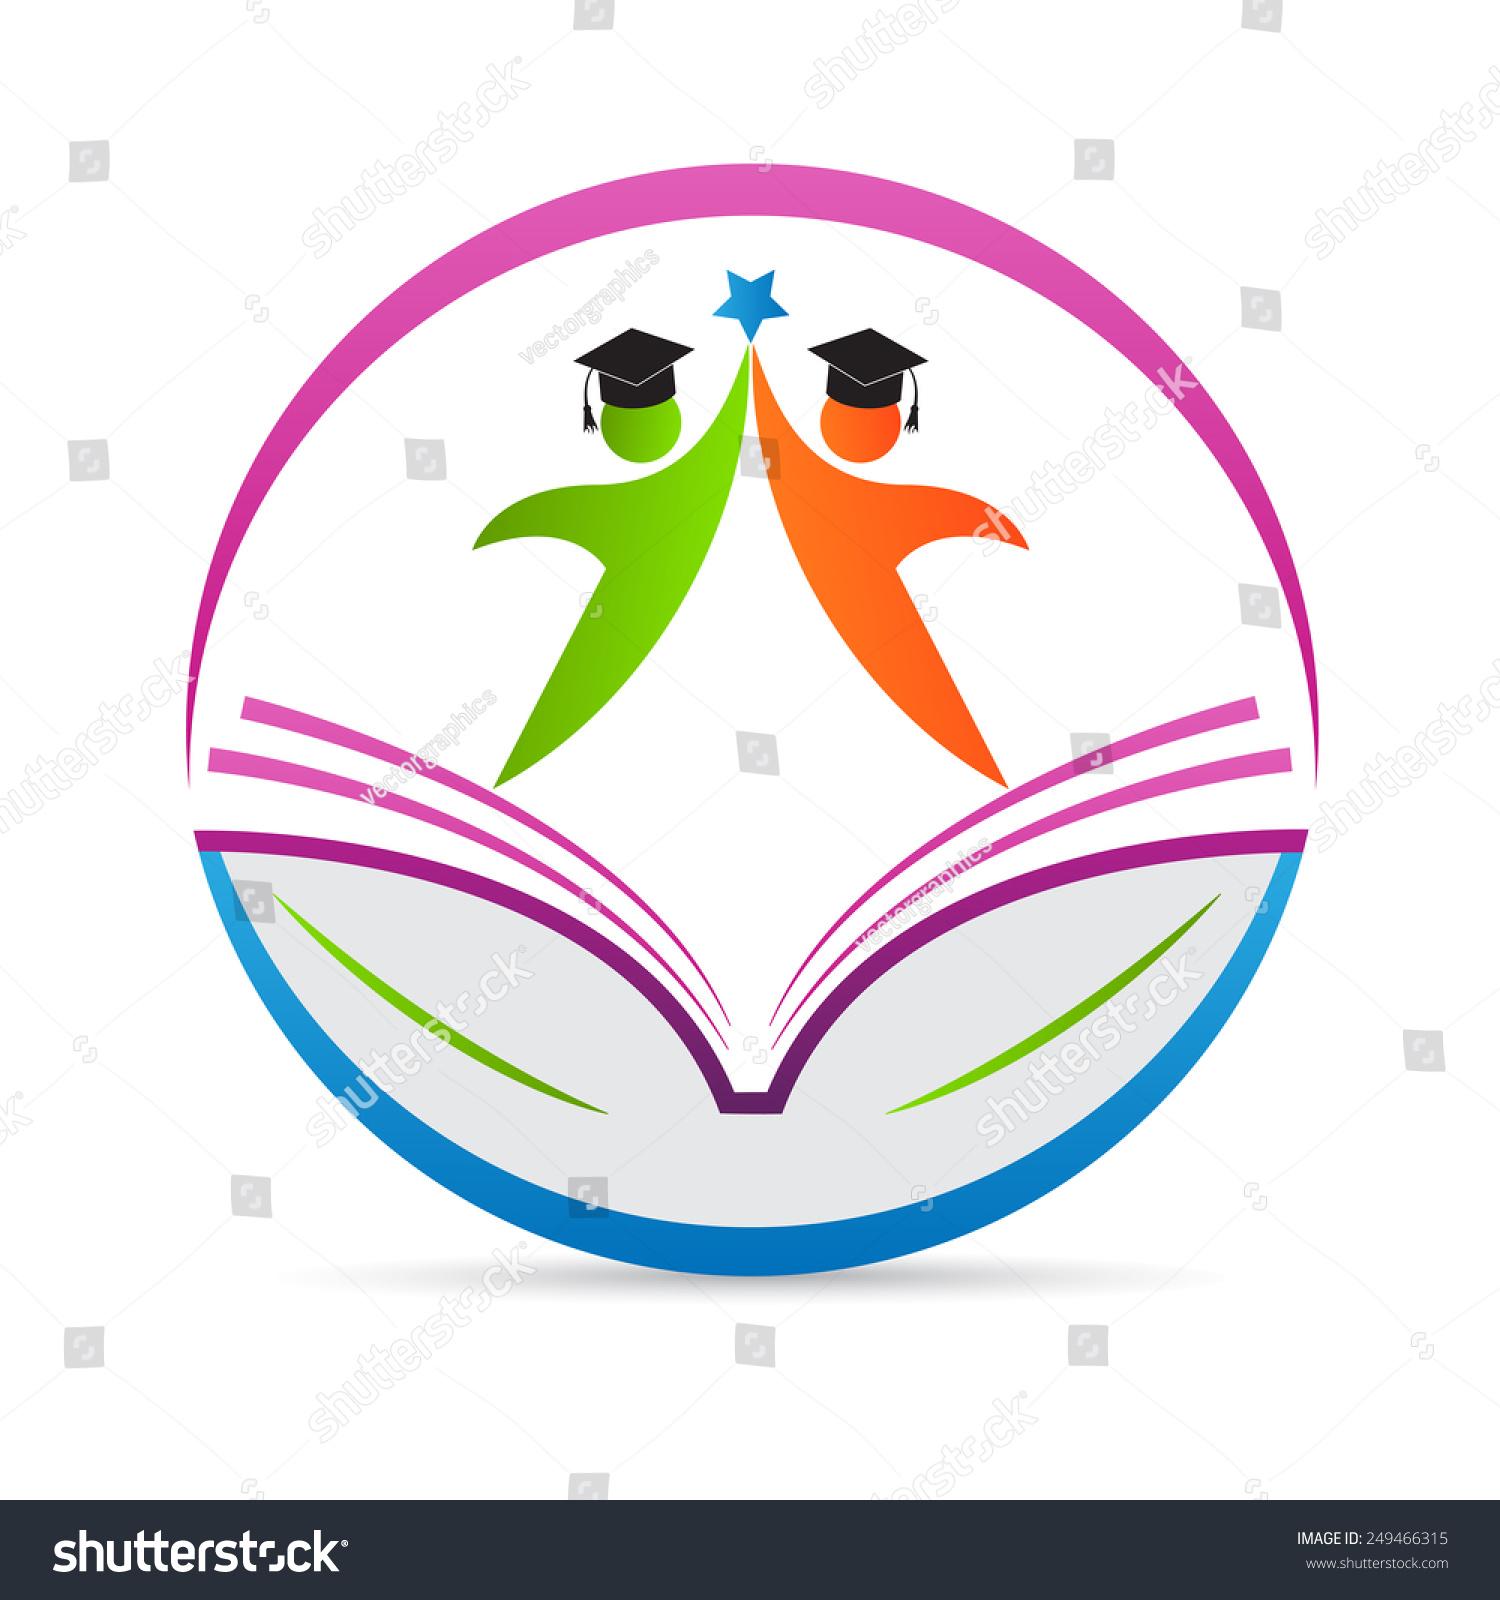 Line Art Logo Maker : Royalty free education logo vector design represents